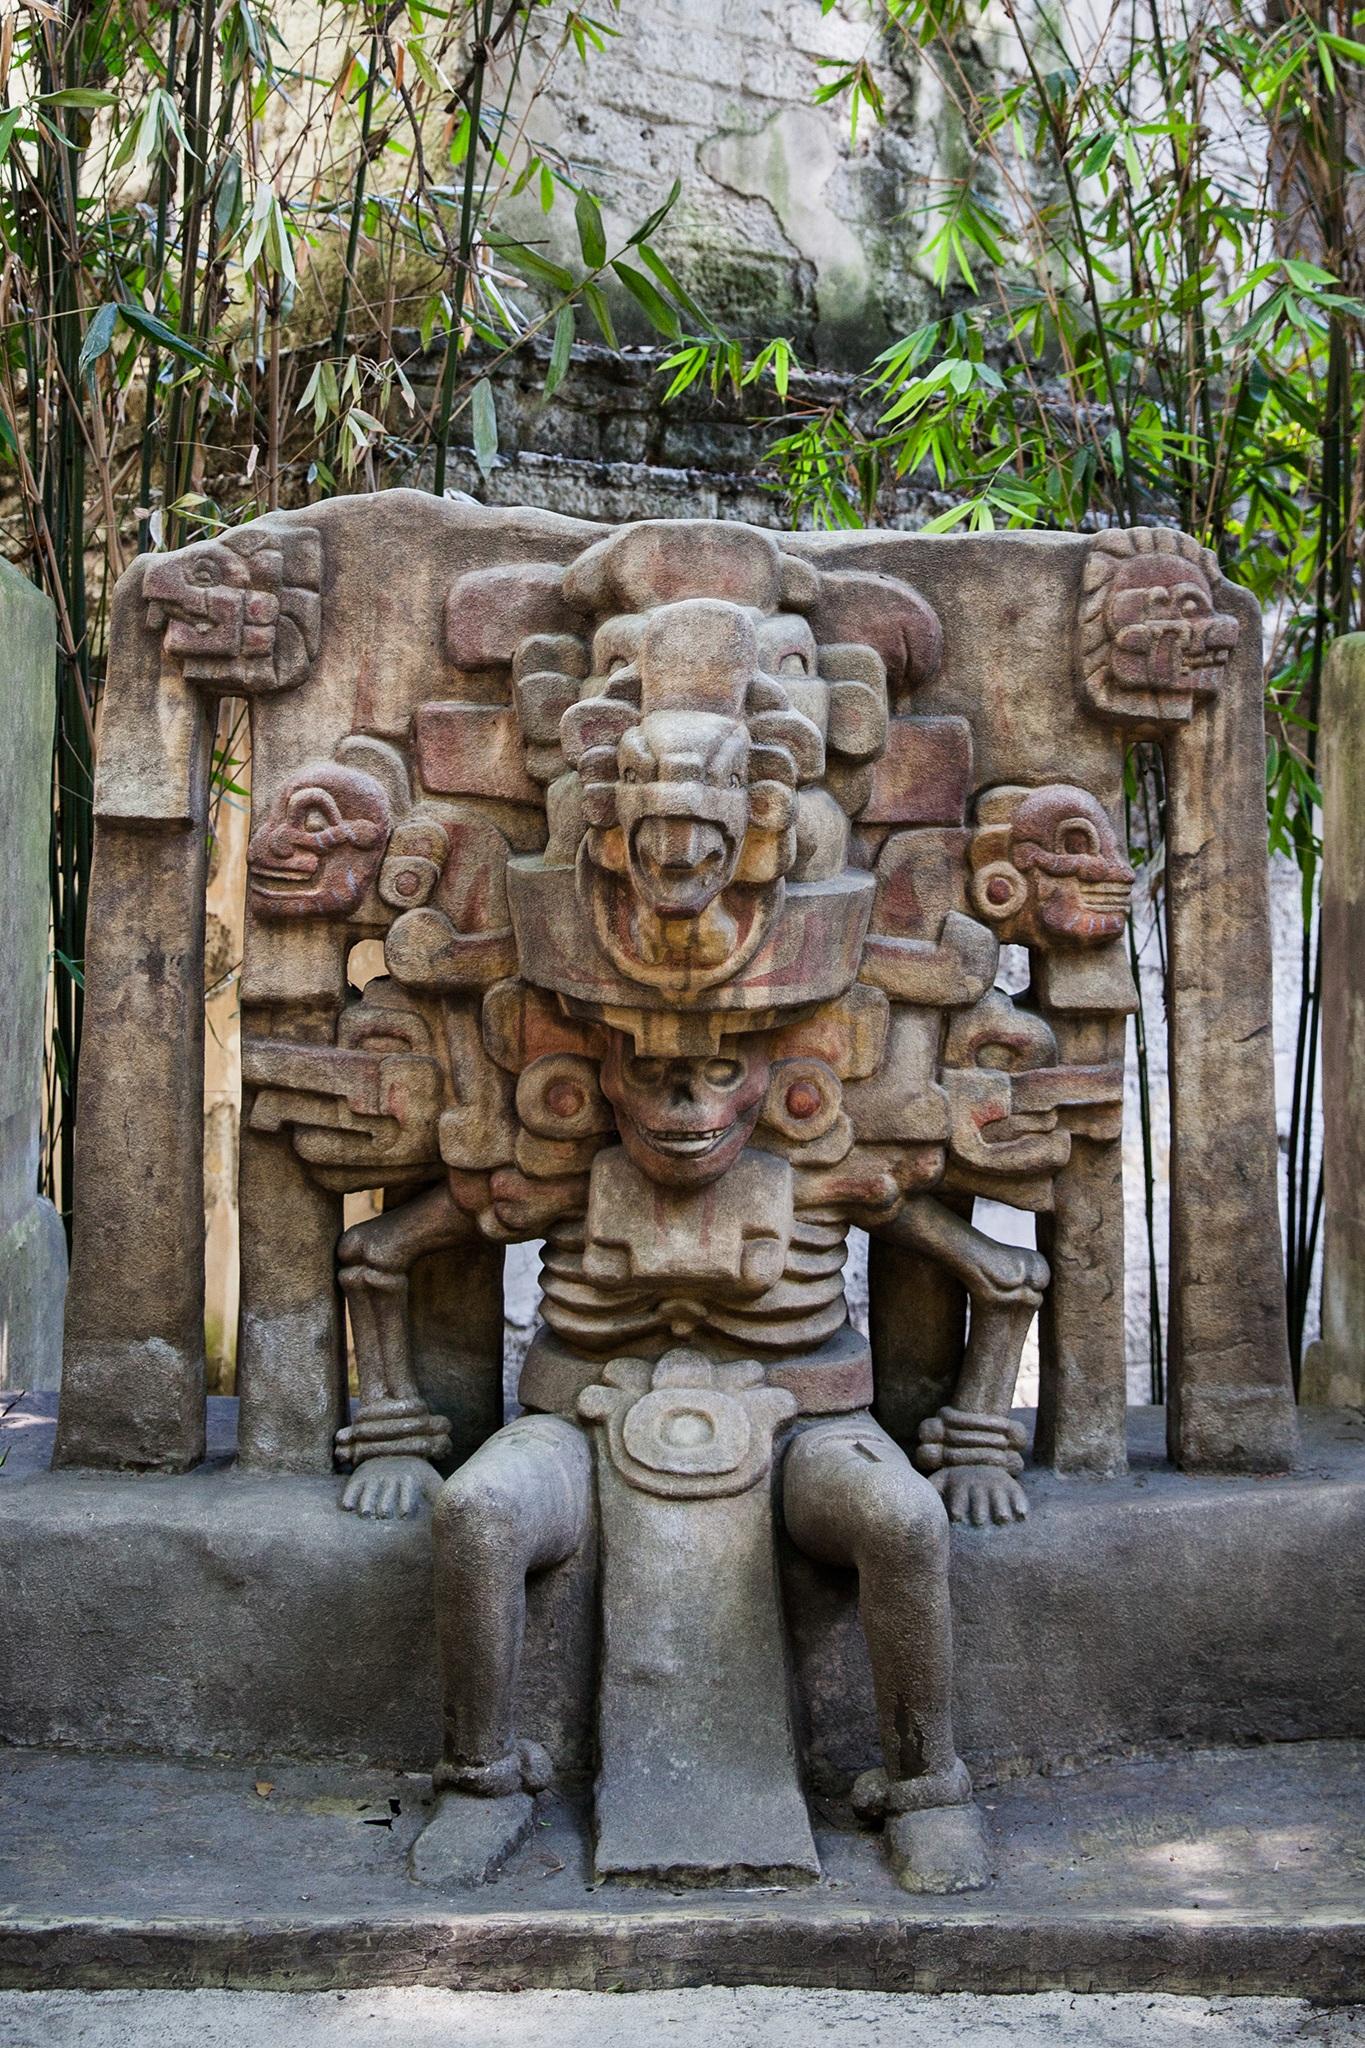 Reproductions of temple carvings at Museo Nacional de Antropología